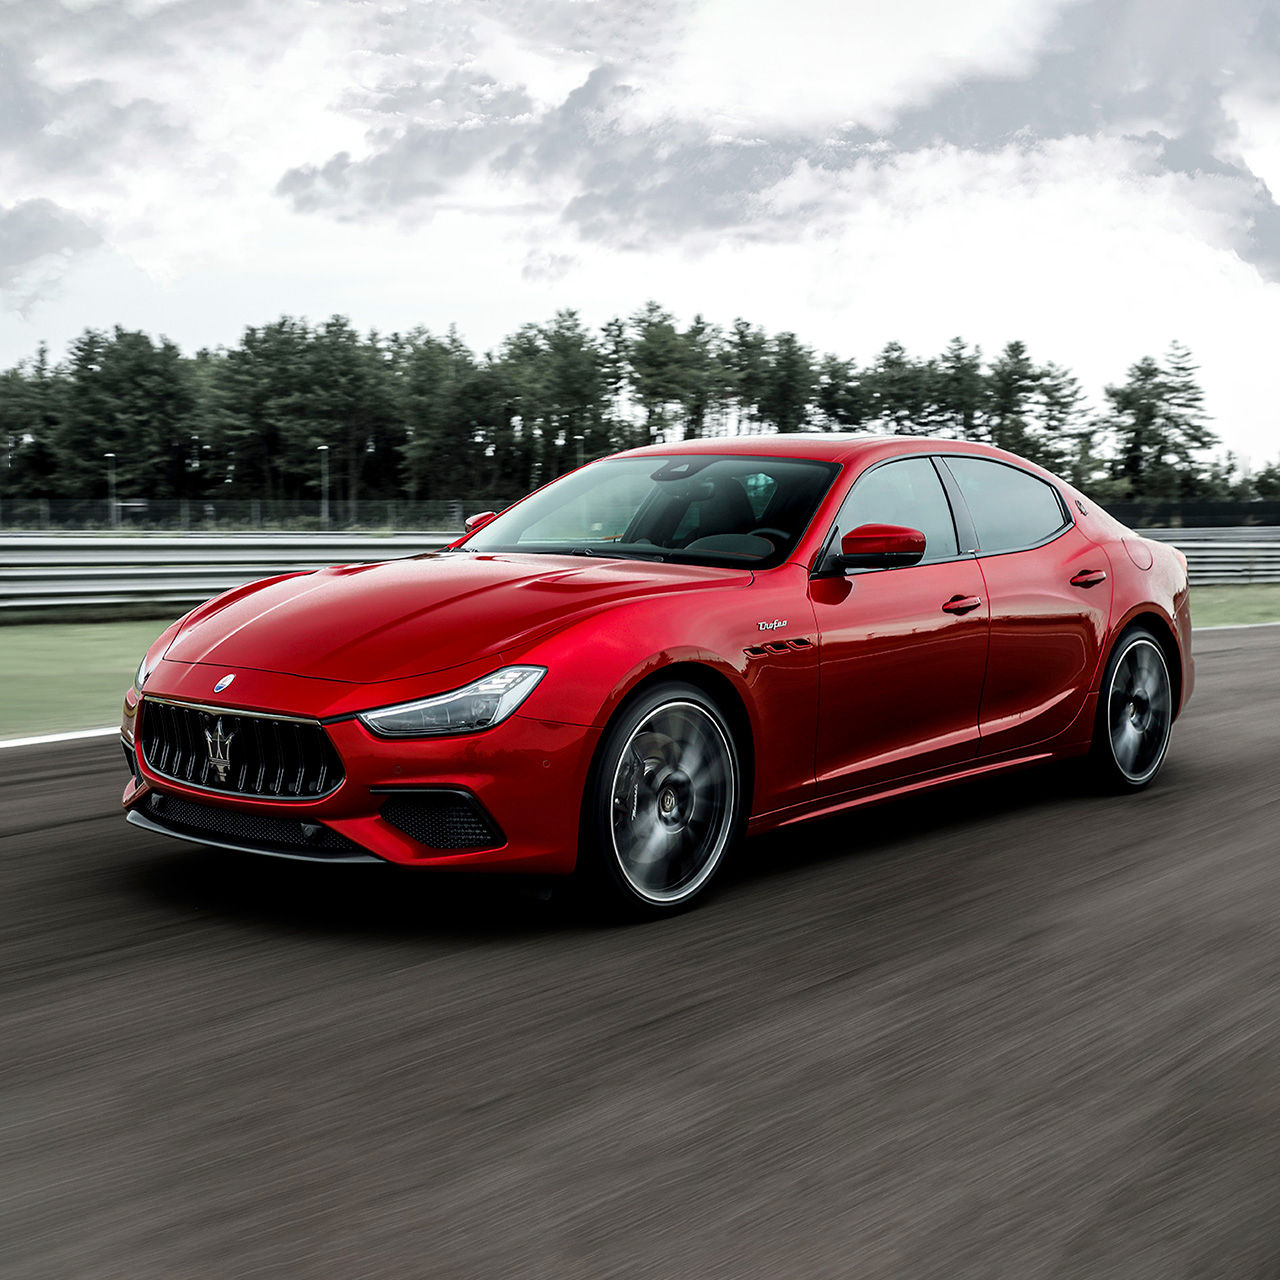 Maserati Ghibli Trofeo - Rot - Auf der Straße